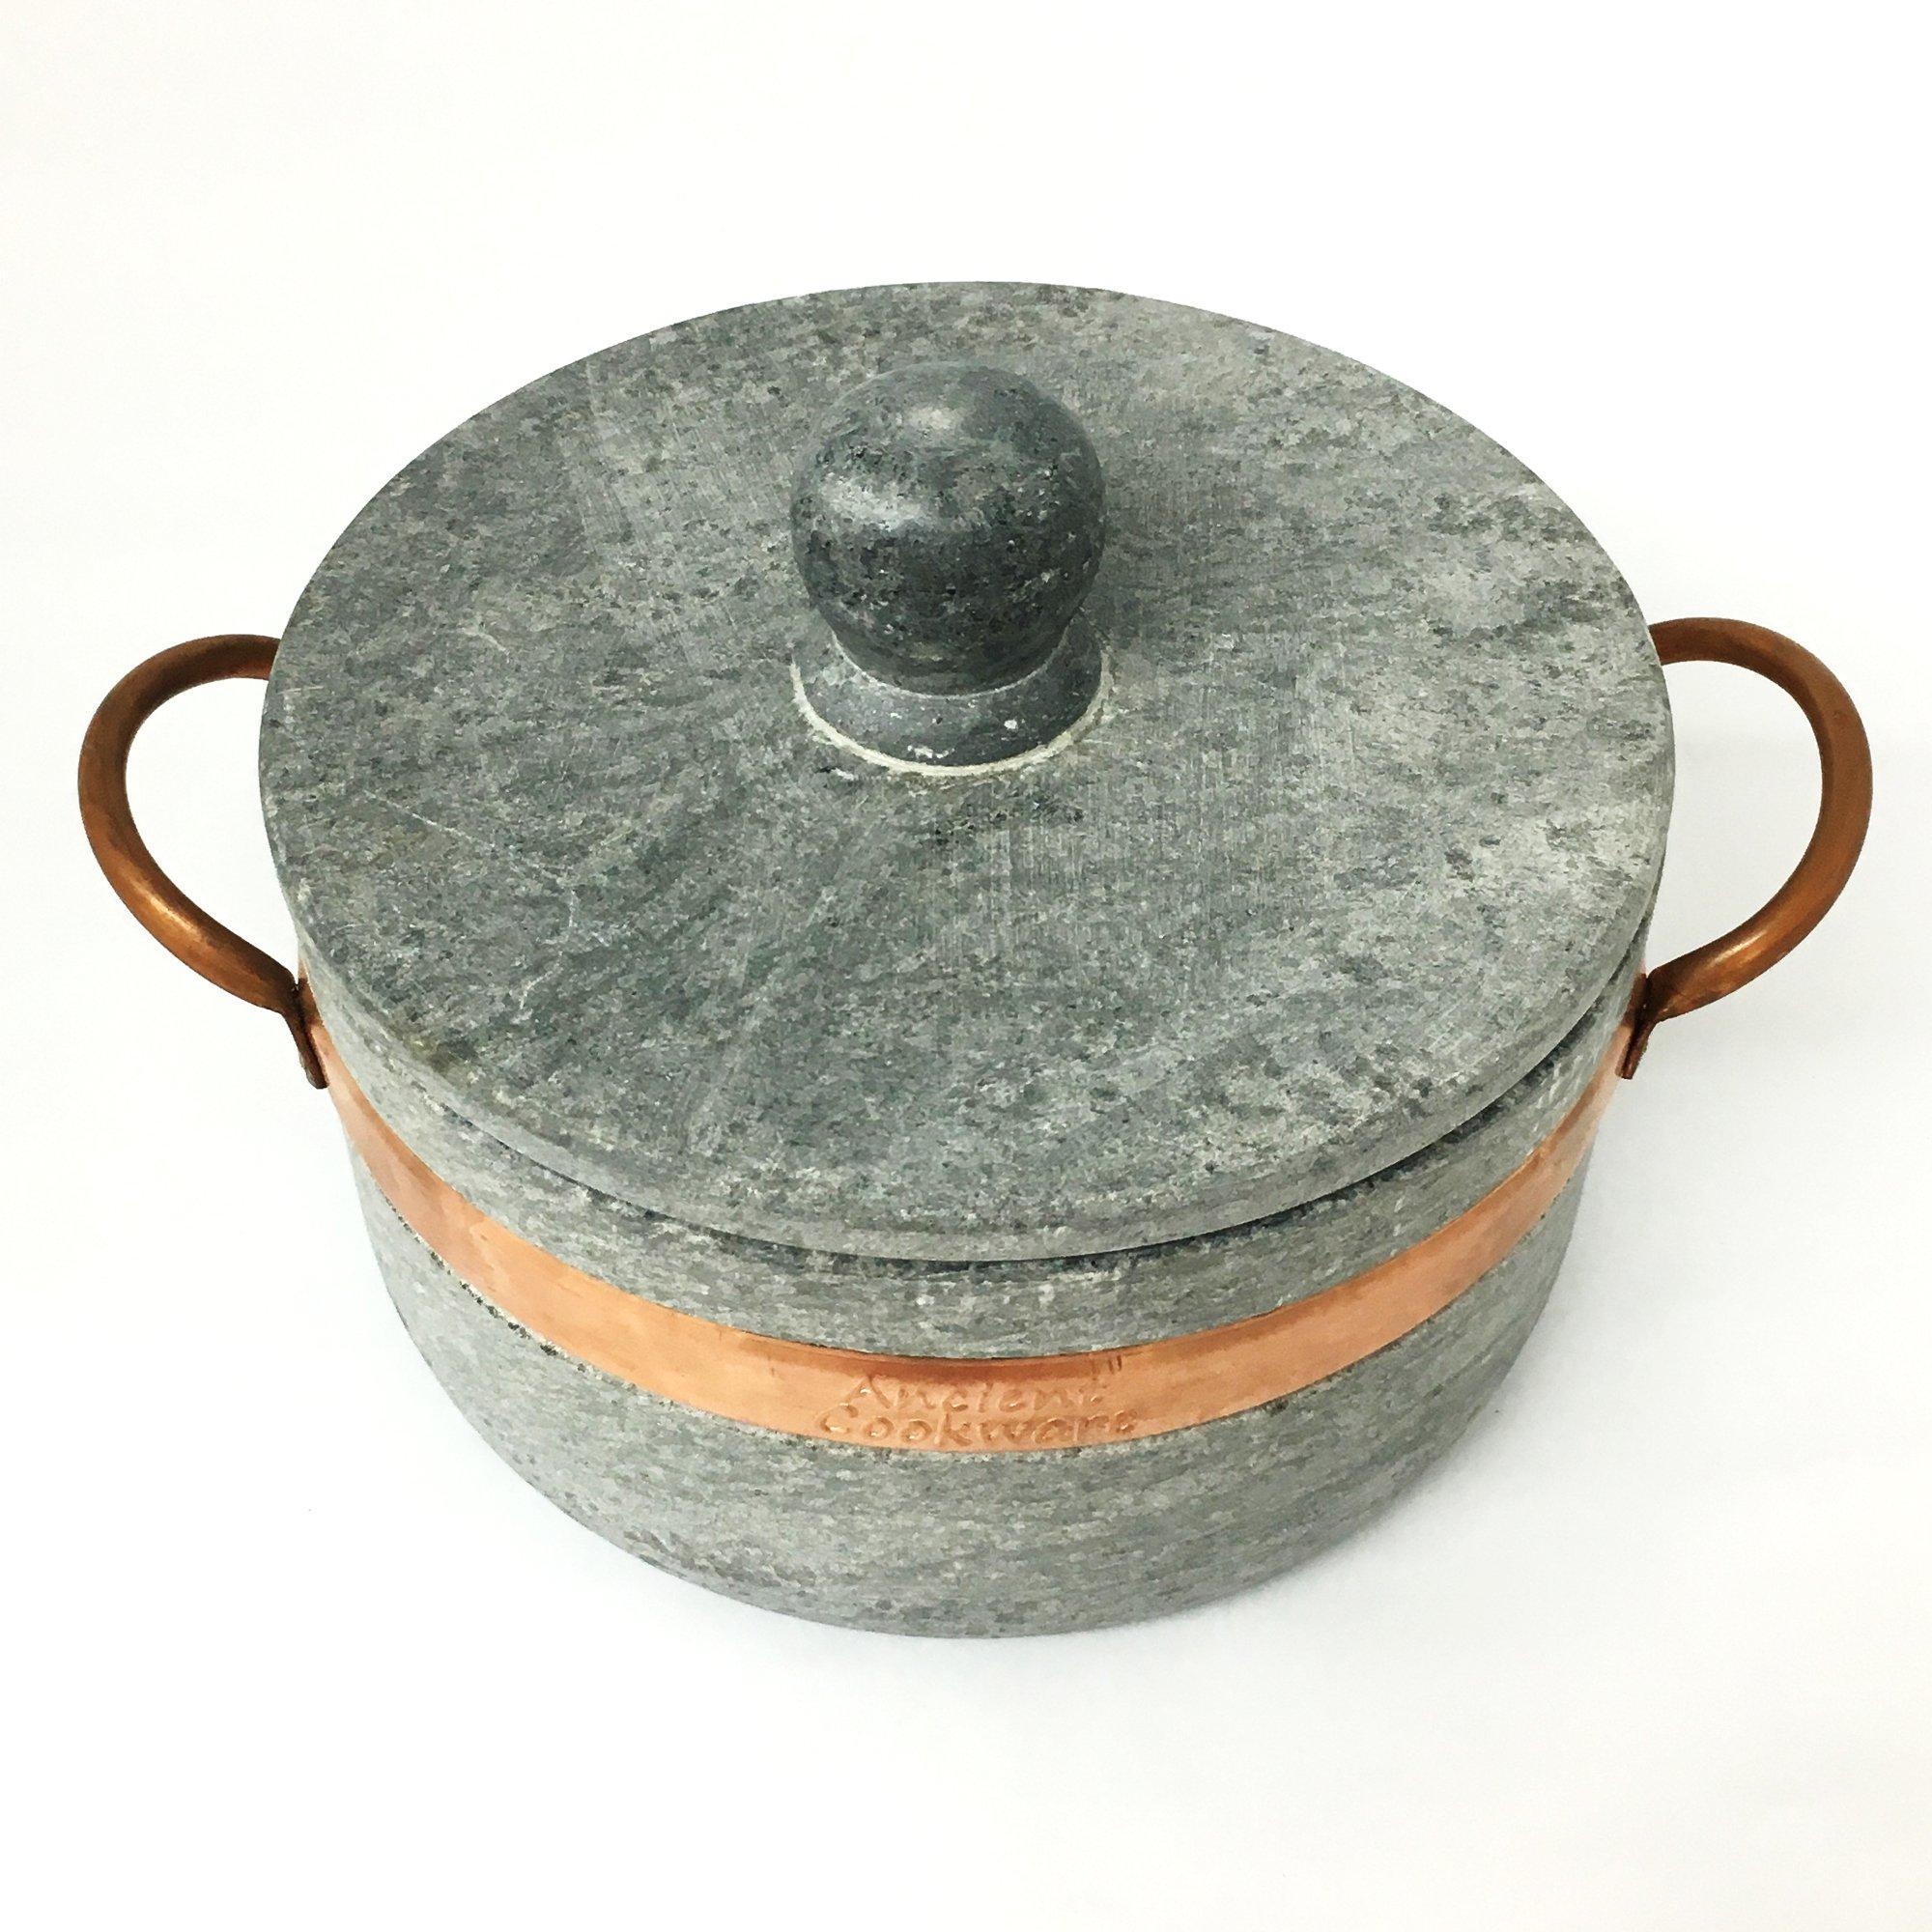 Brazilian Soap Stone Stew Pot - Medium - Panela de Pedra